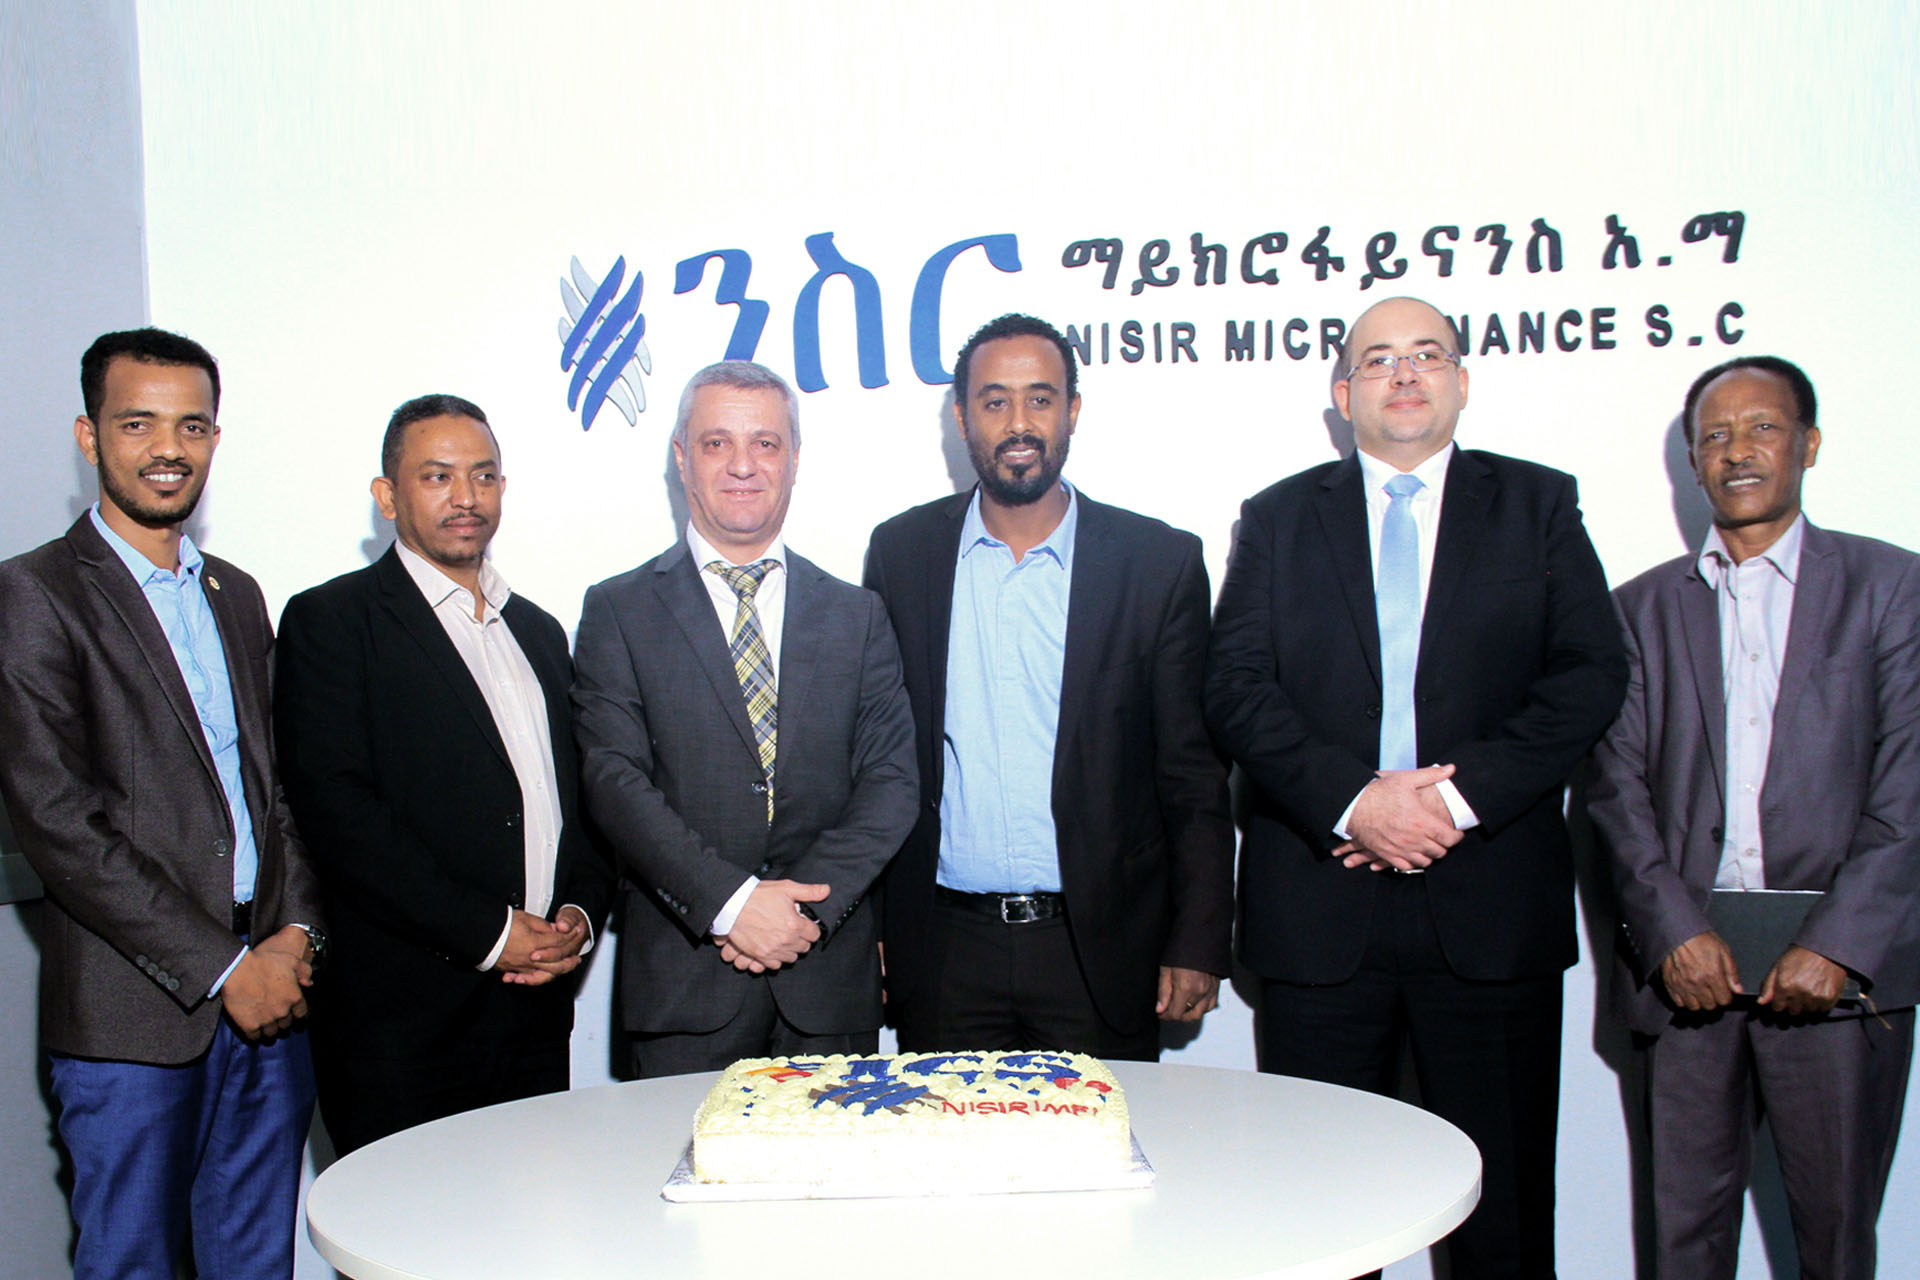 Nisir Microfinance Institution Chooses ICS BANKS